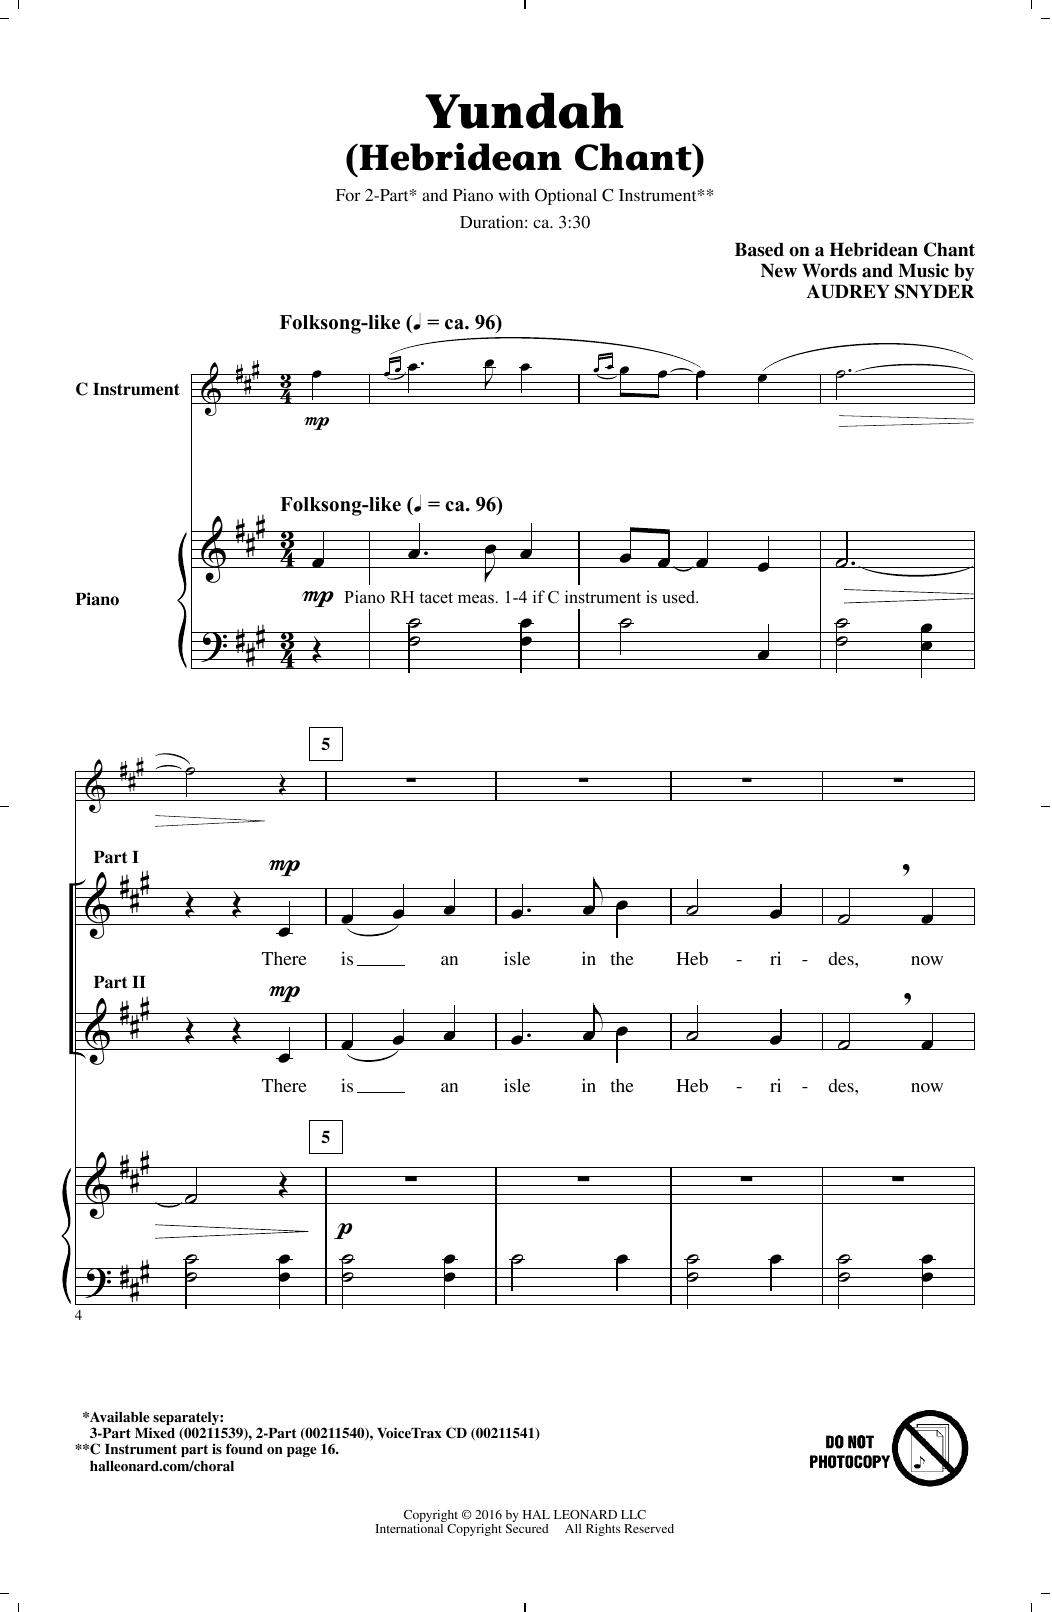 Yundah (Hebridean Chant) (2-Part Choir)